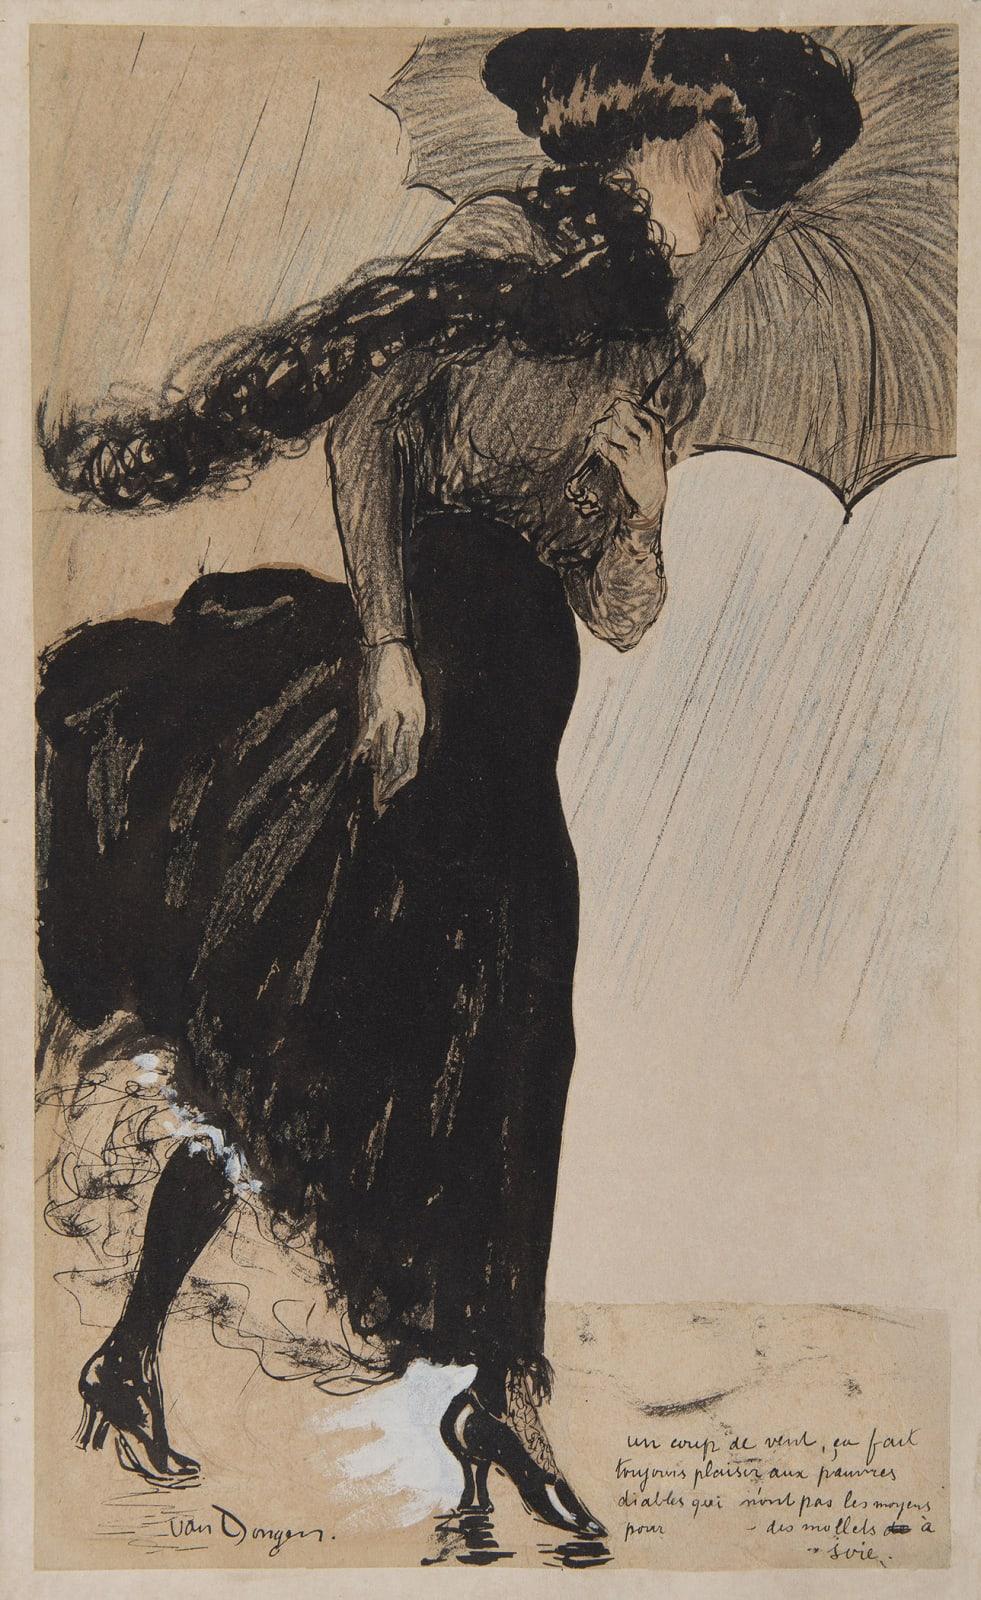 KEES VAN DONGEN, Un coup de vent, 1901